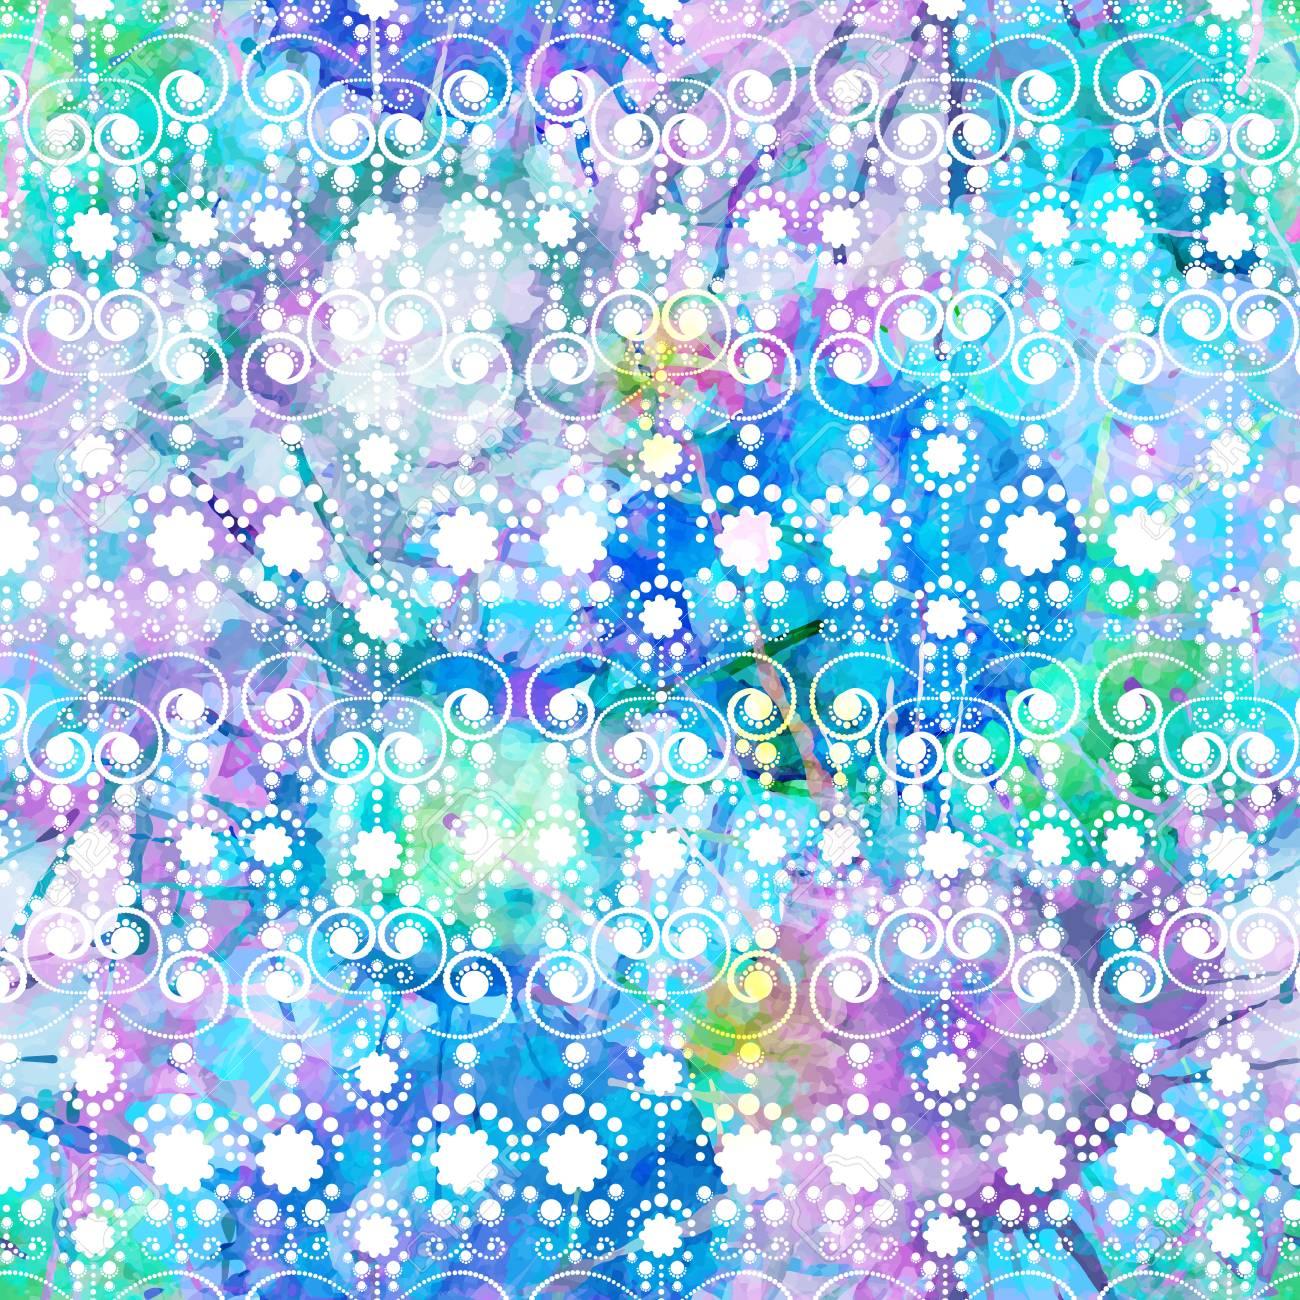 Seamless vintage pattern. - 52231661